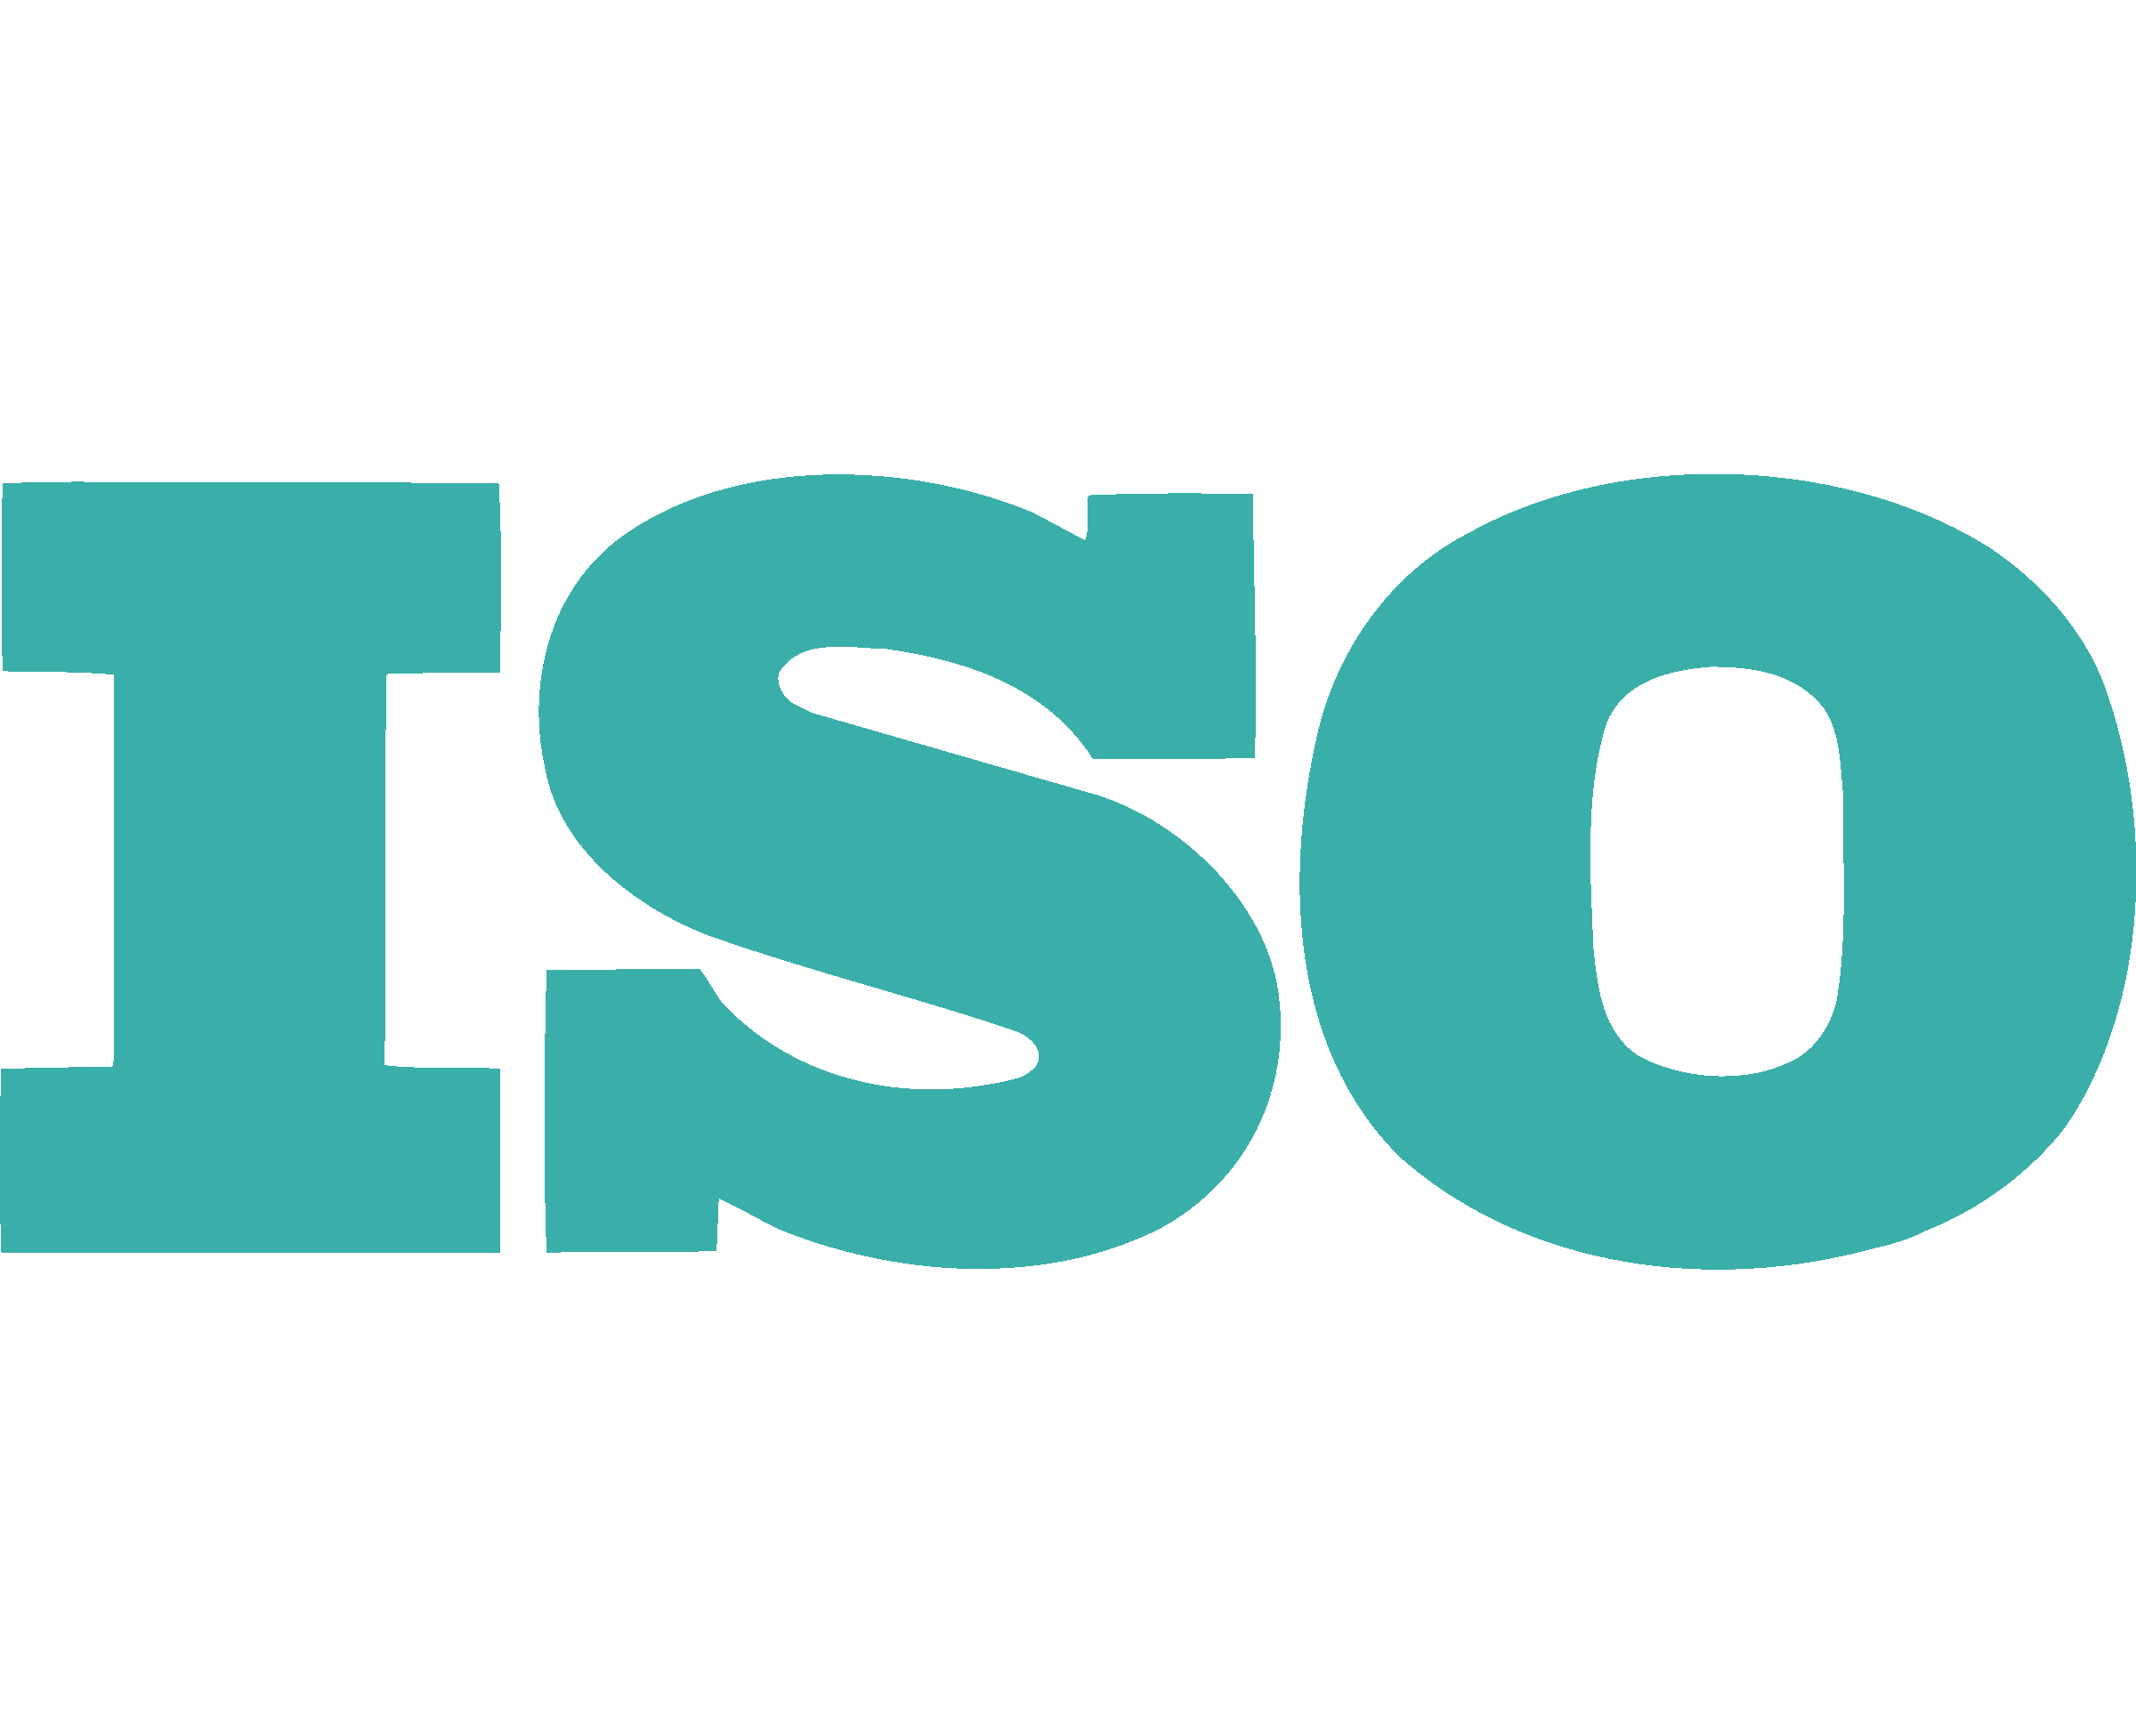 Vas Engineering ISO 9001:2015 logo